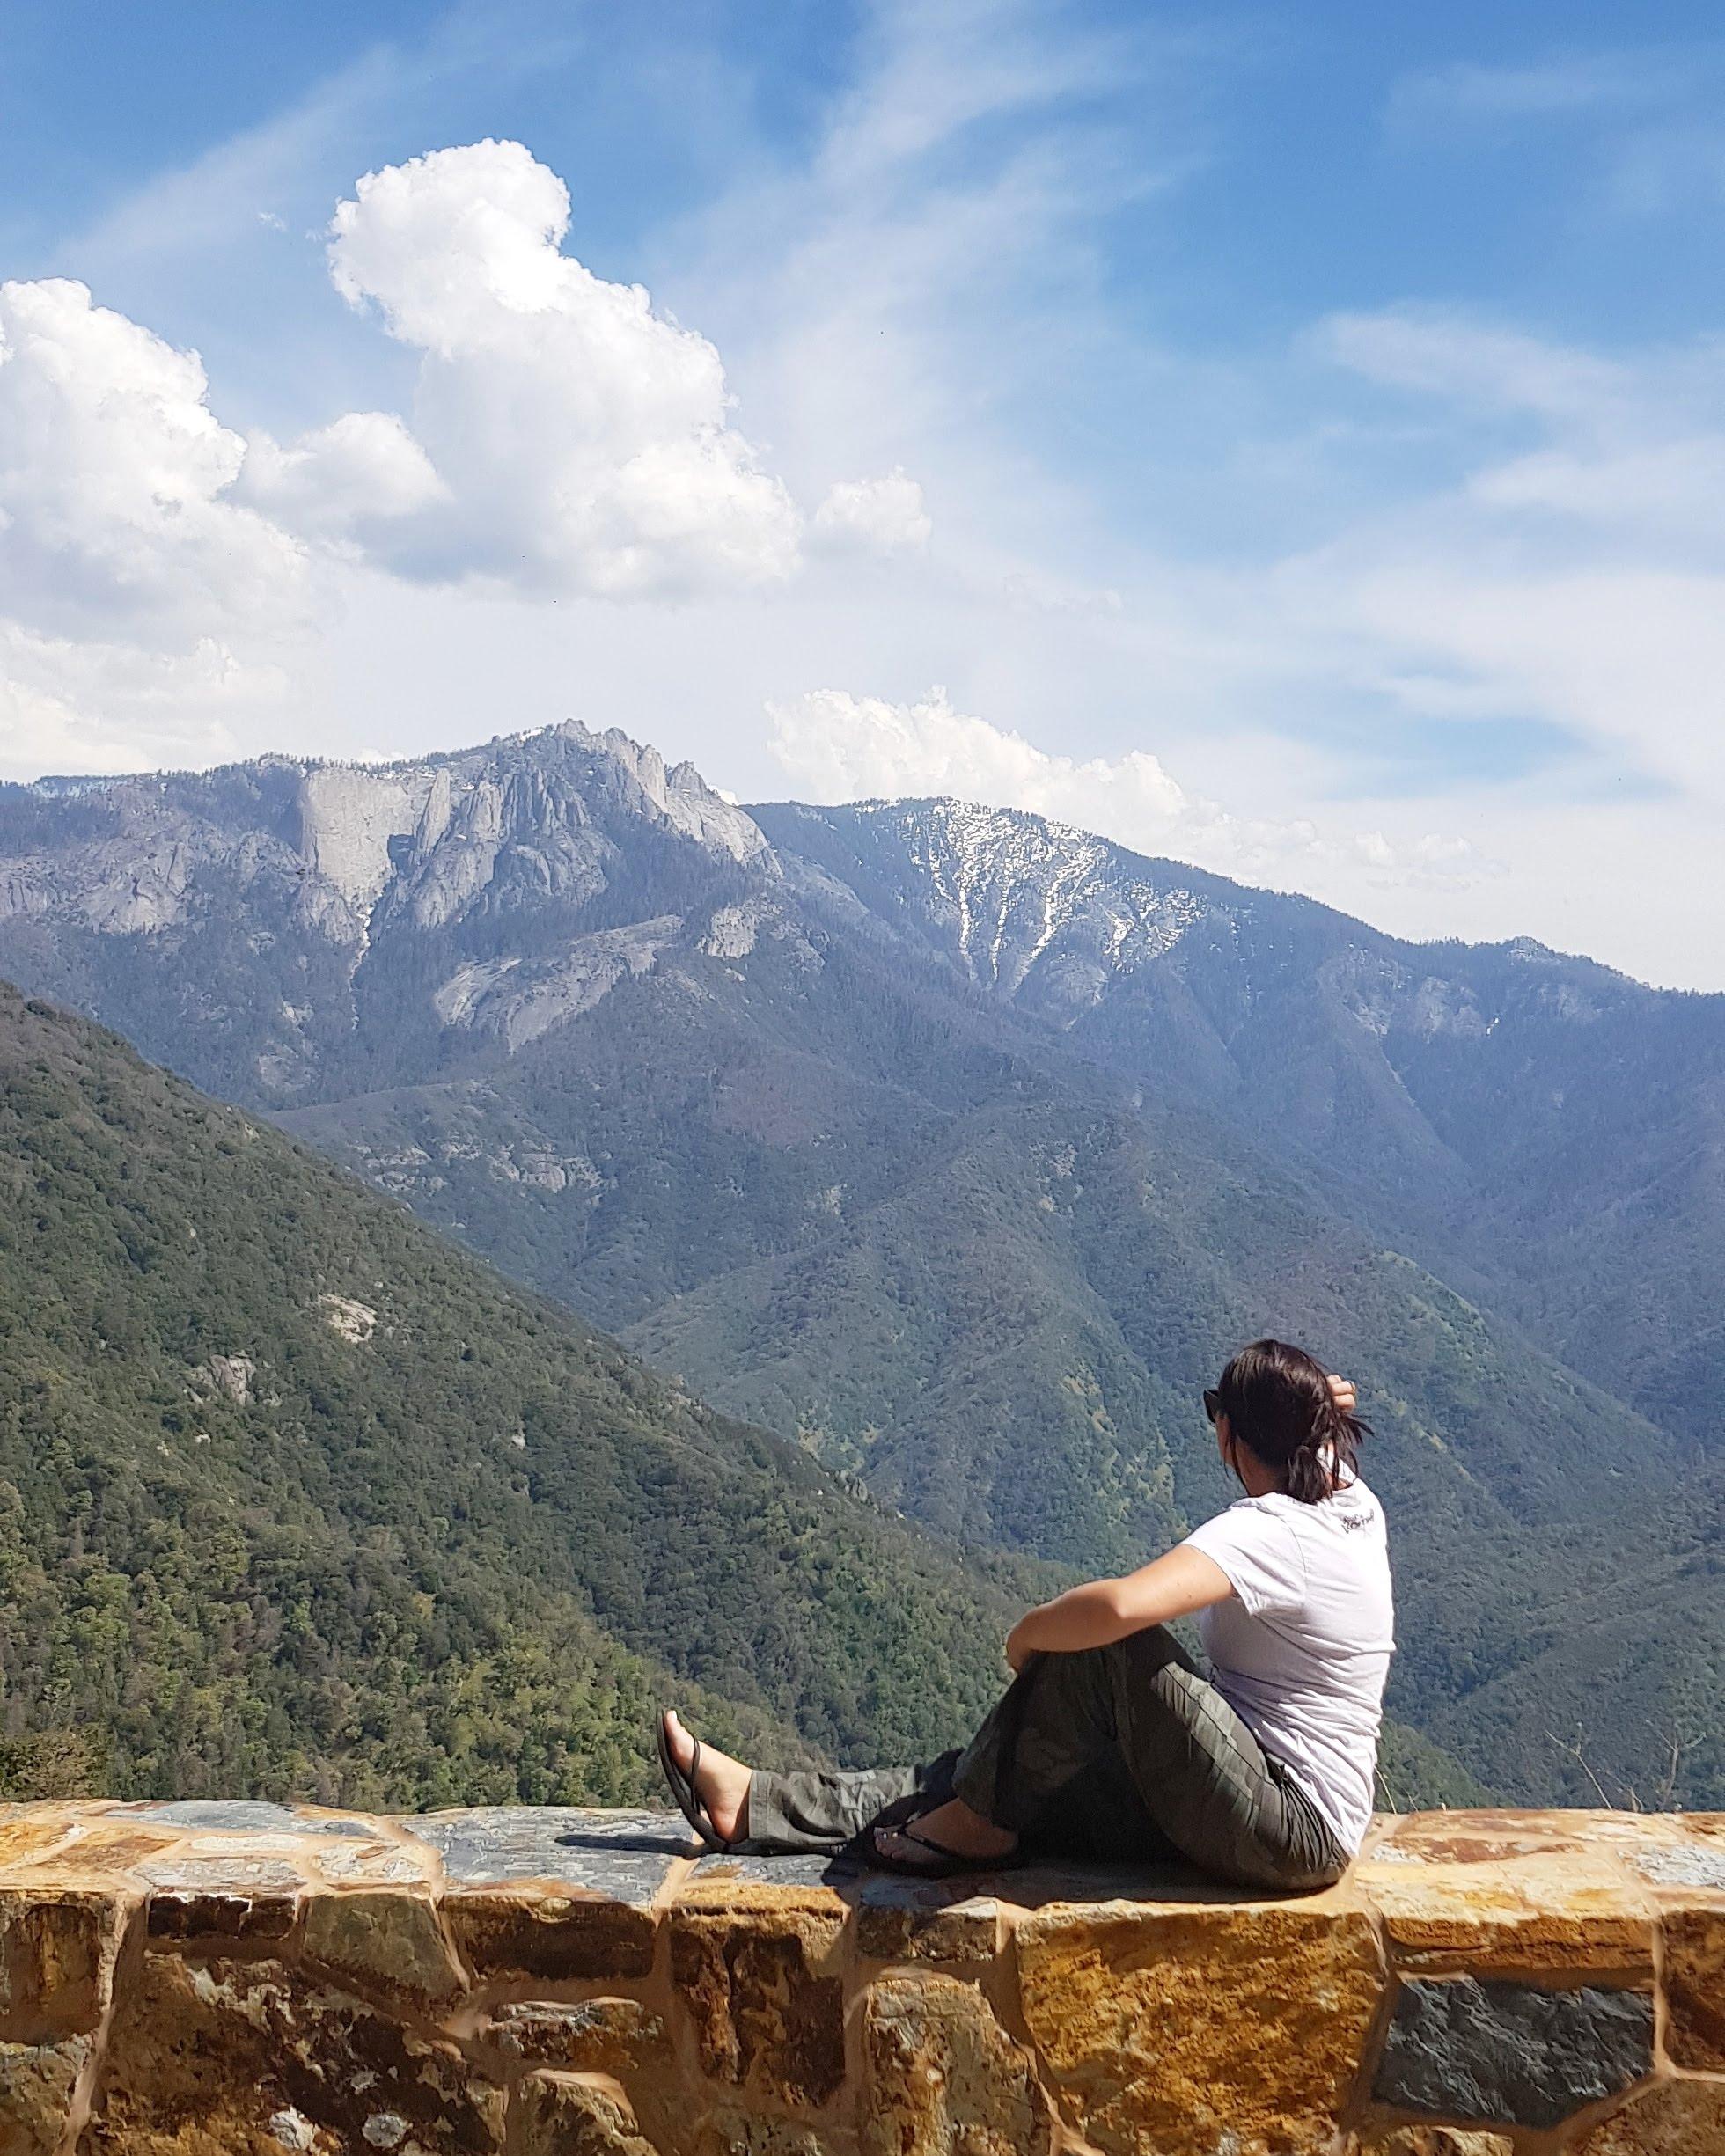 scenic sequoia national park travel vlog blog campervan views